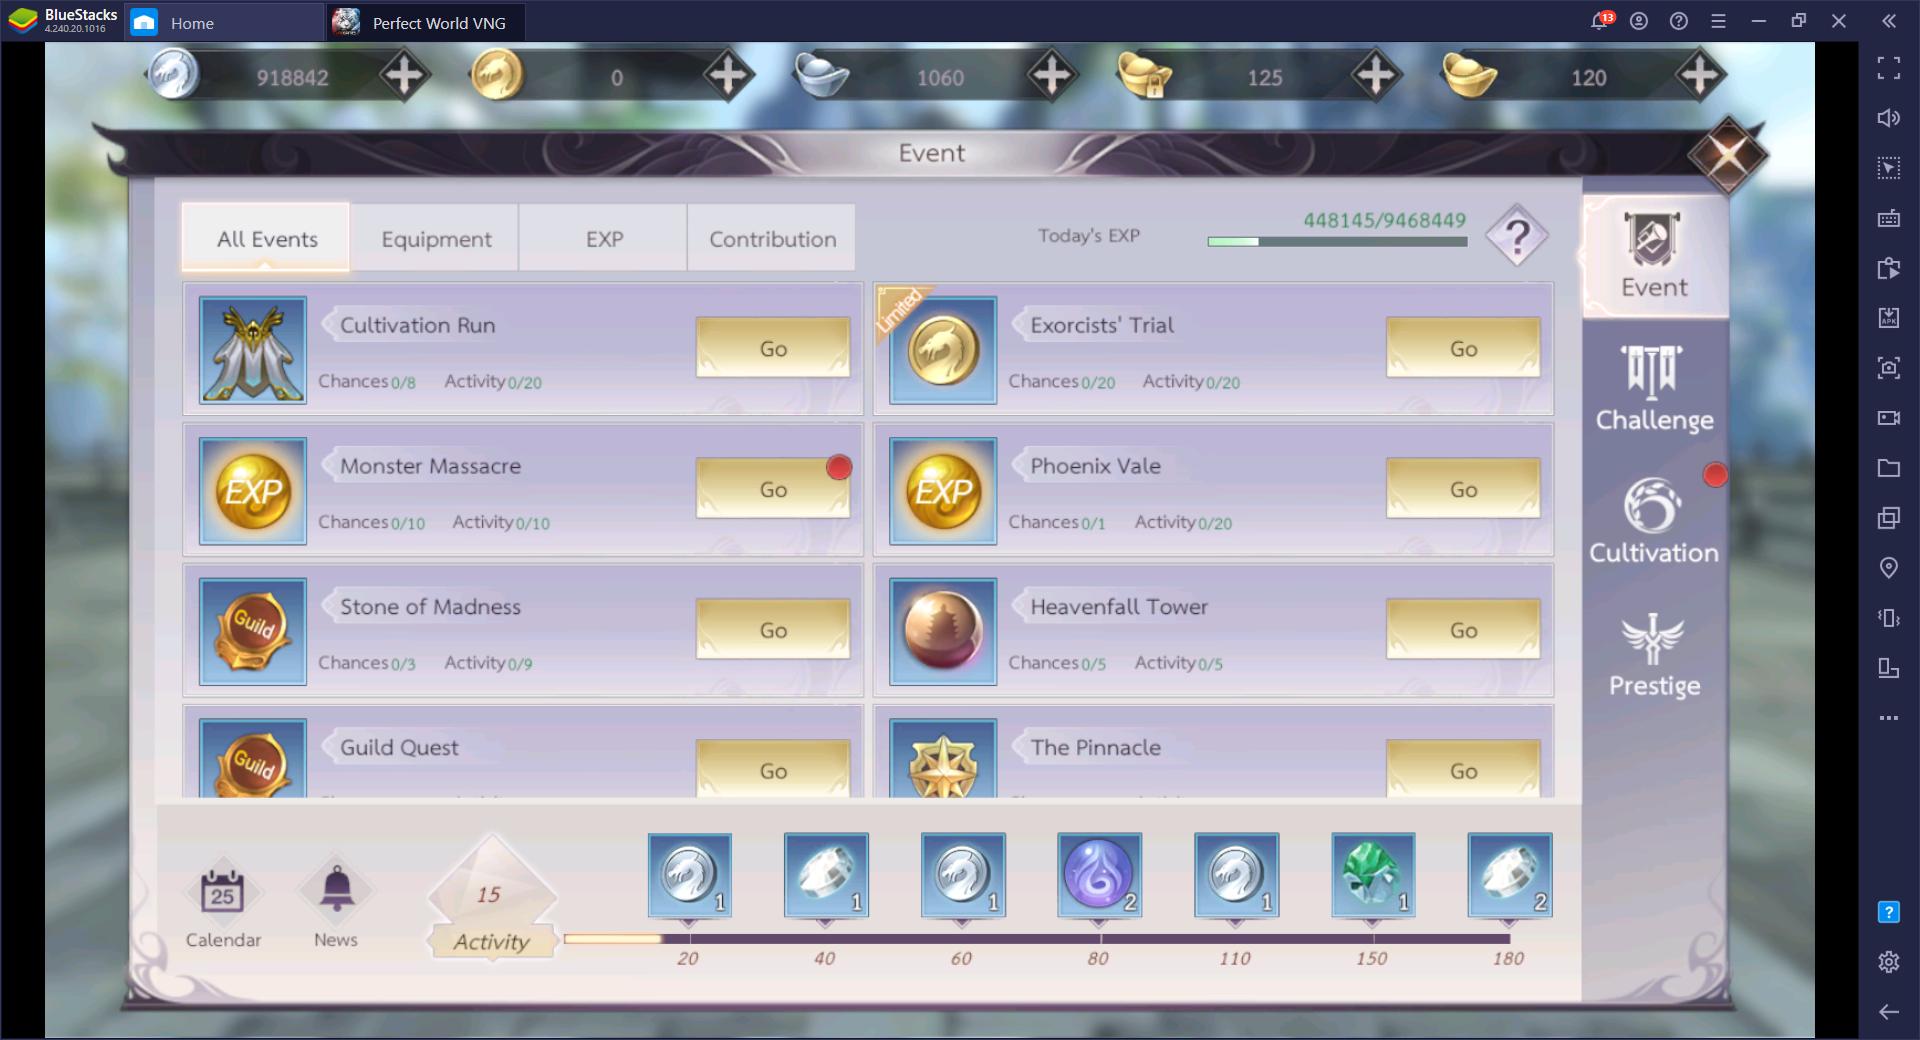 Panduan dan tips bermain Perfect World VNG